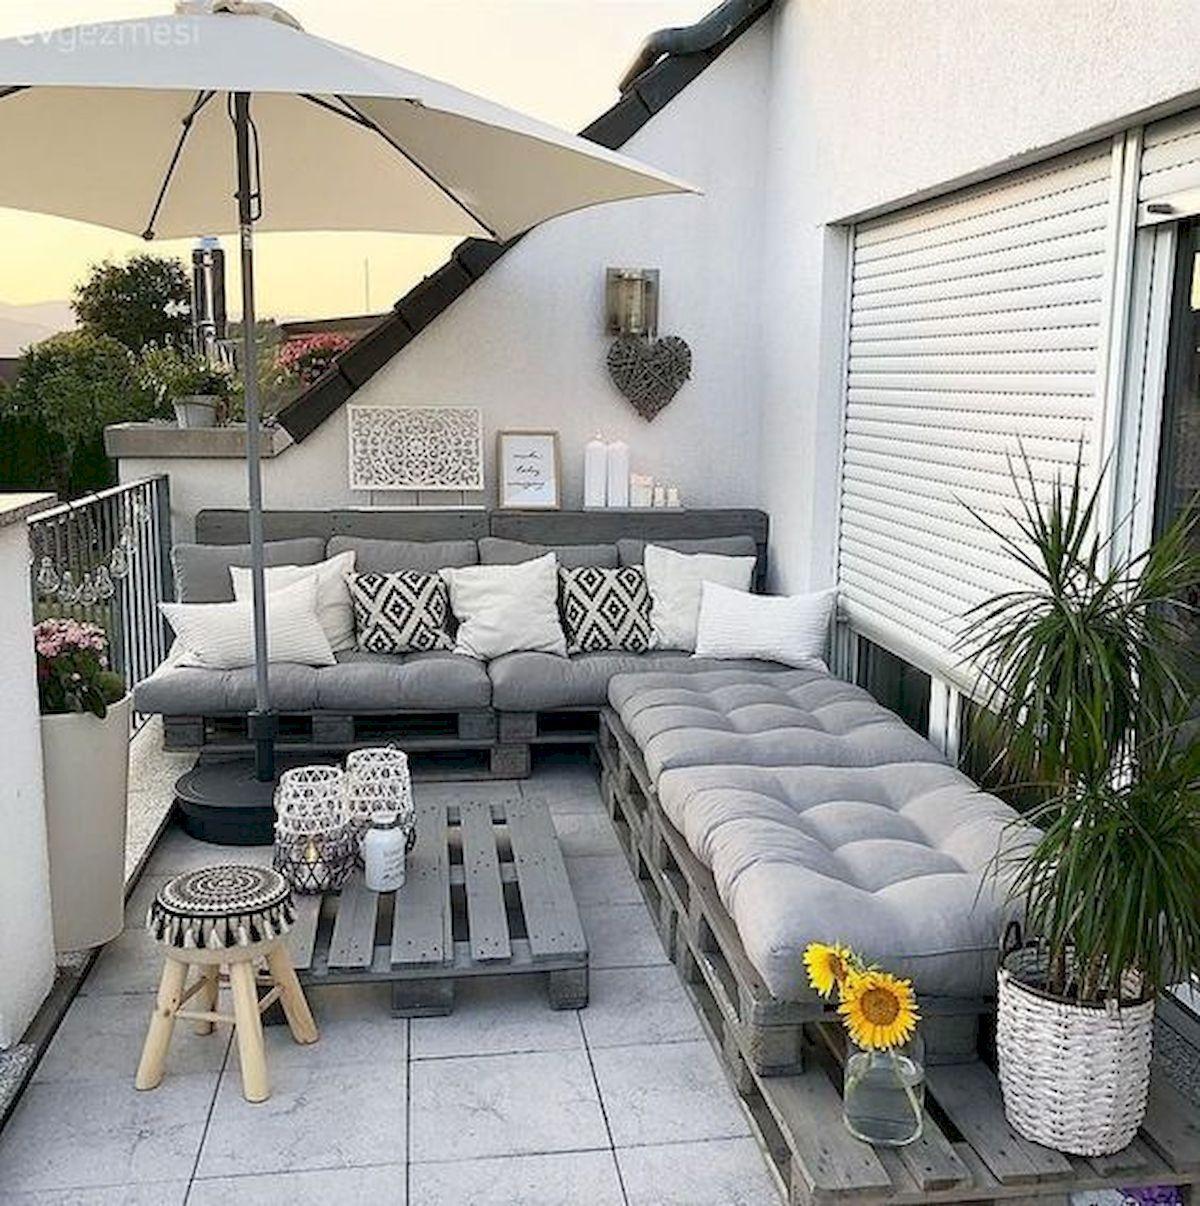 Arredo Balconi E Terrazze 30 stunning balcony garden design ideas and decorations